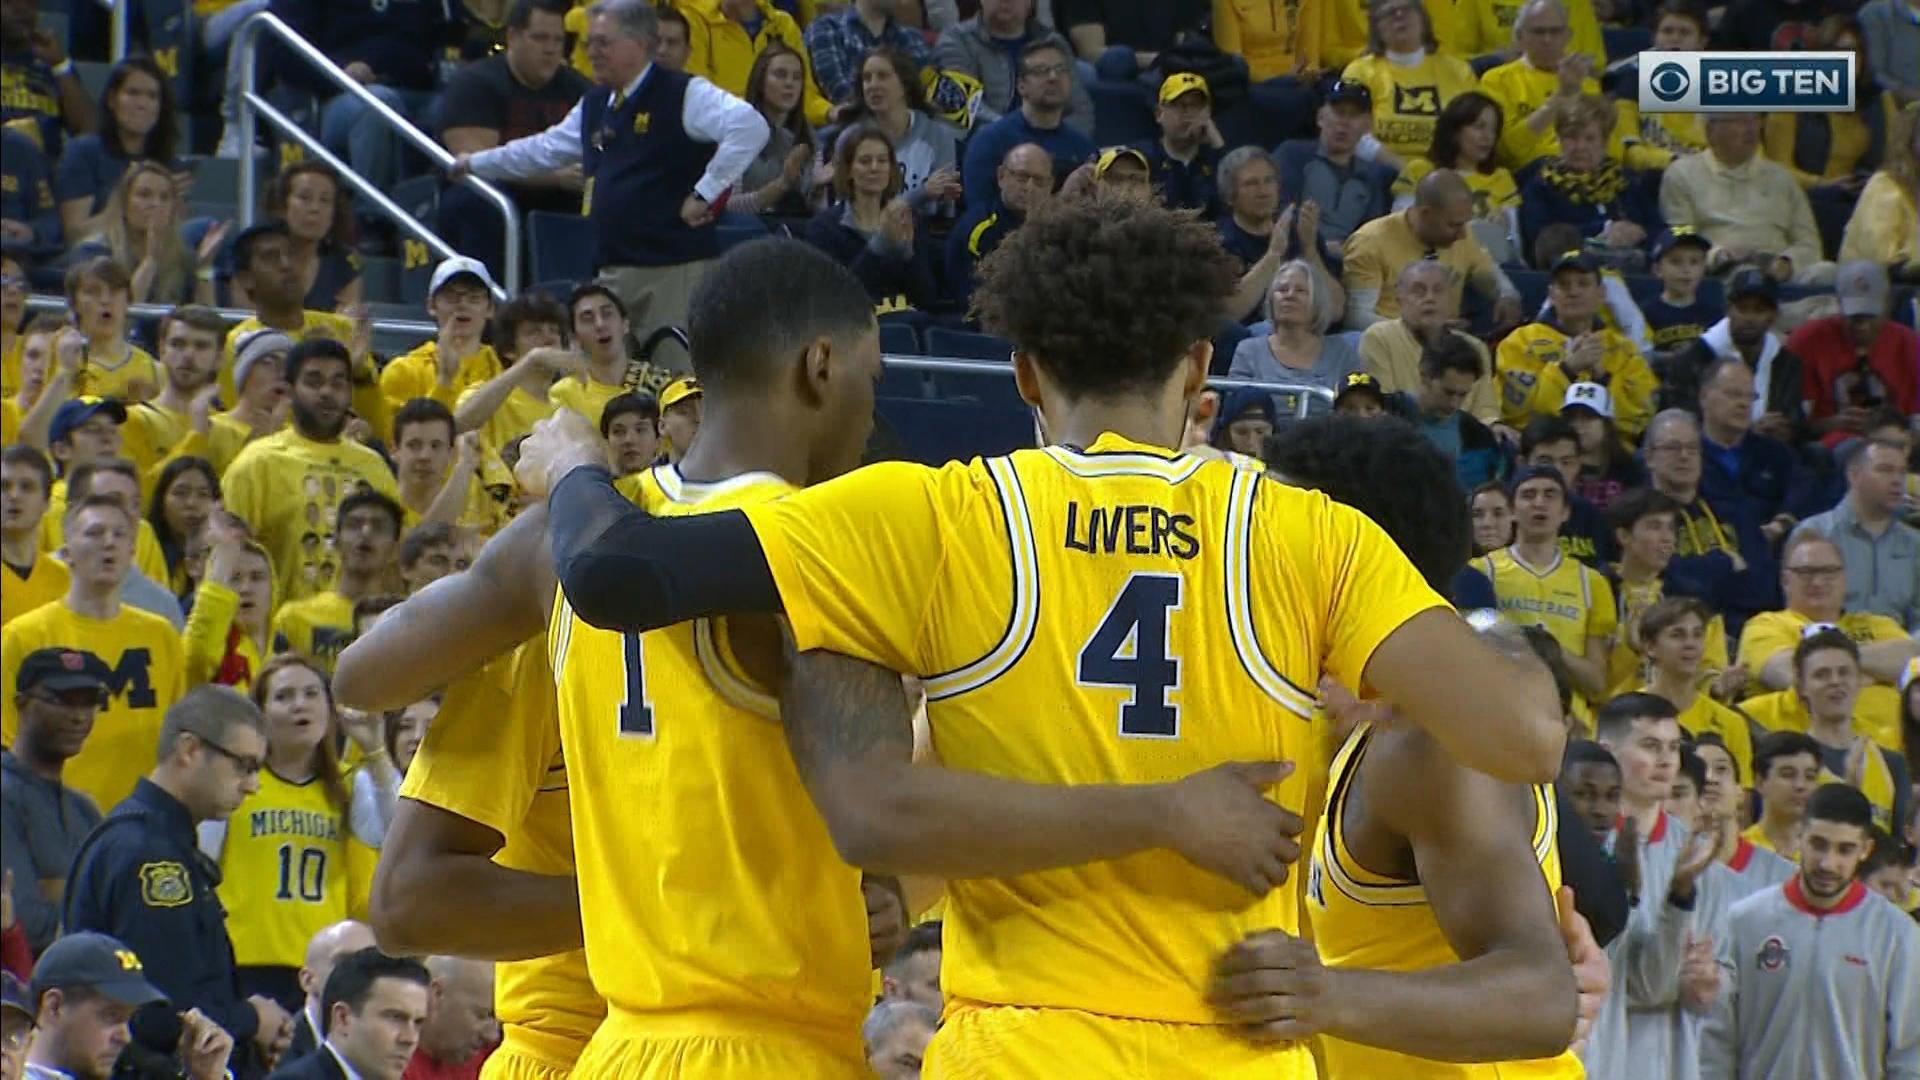 WATCH: Michigan Takes Down NO. 8 Ohio State